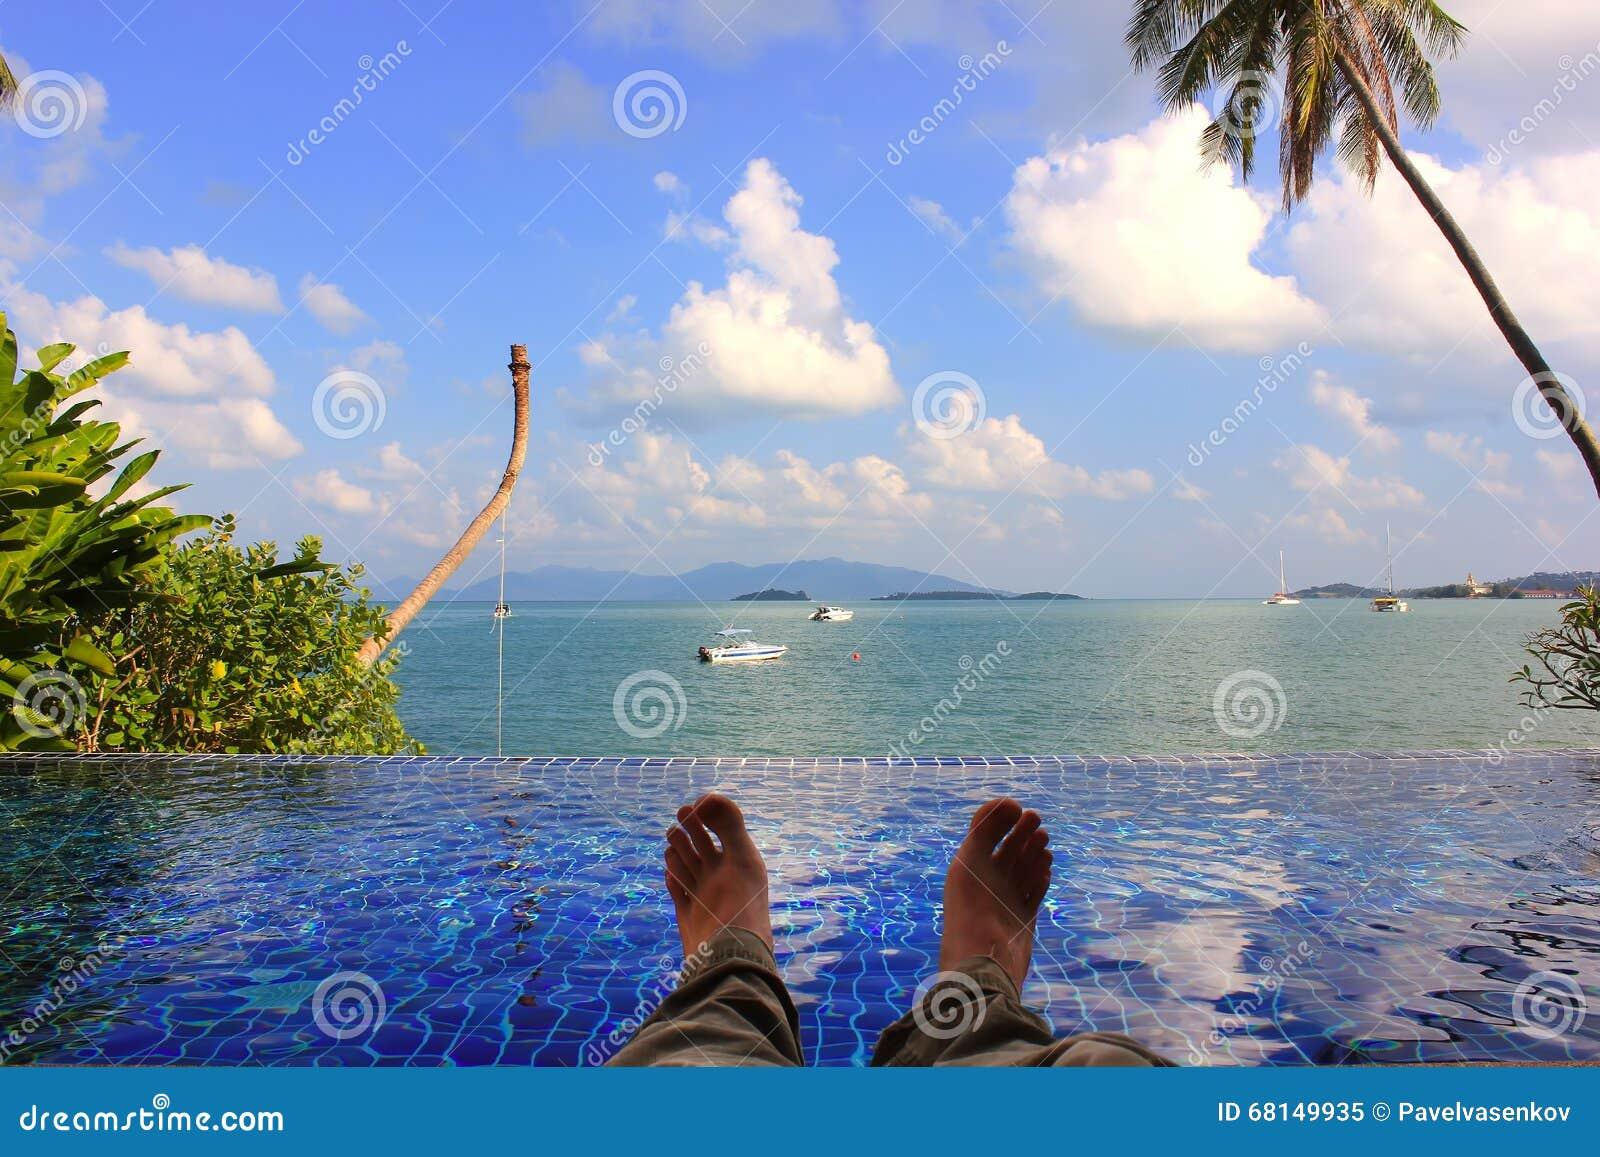 Koppla av på stranden i Thailand, Asien